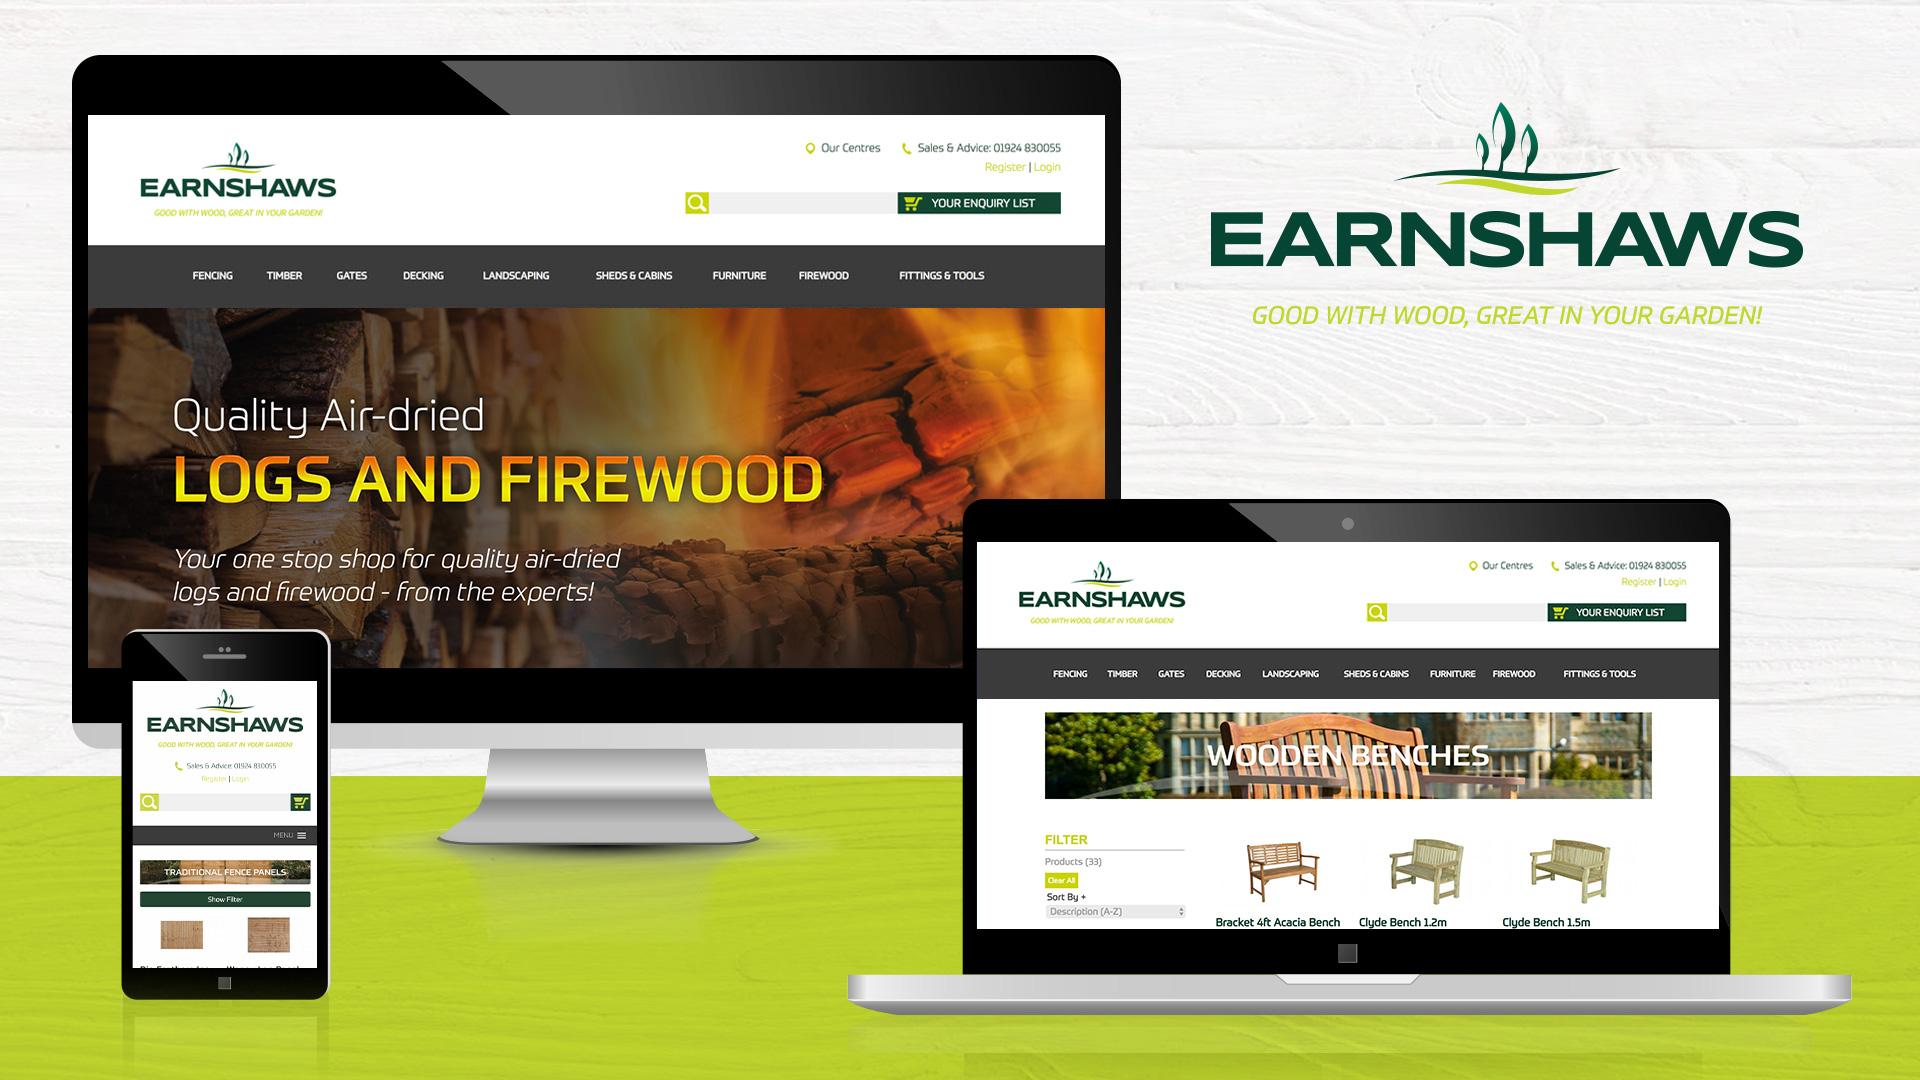 Blacksmith Marketing - Website developing for Earnshaws Fencing Centres